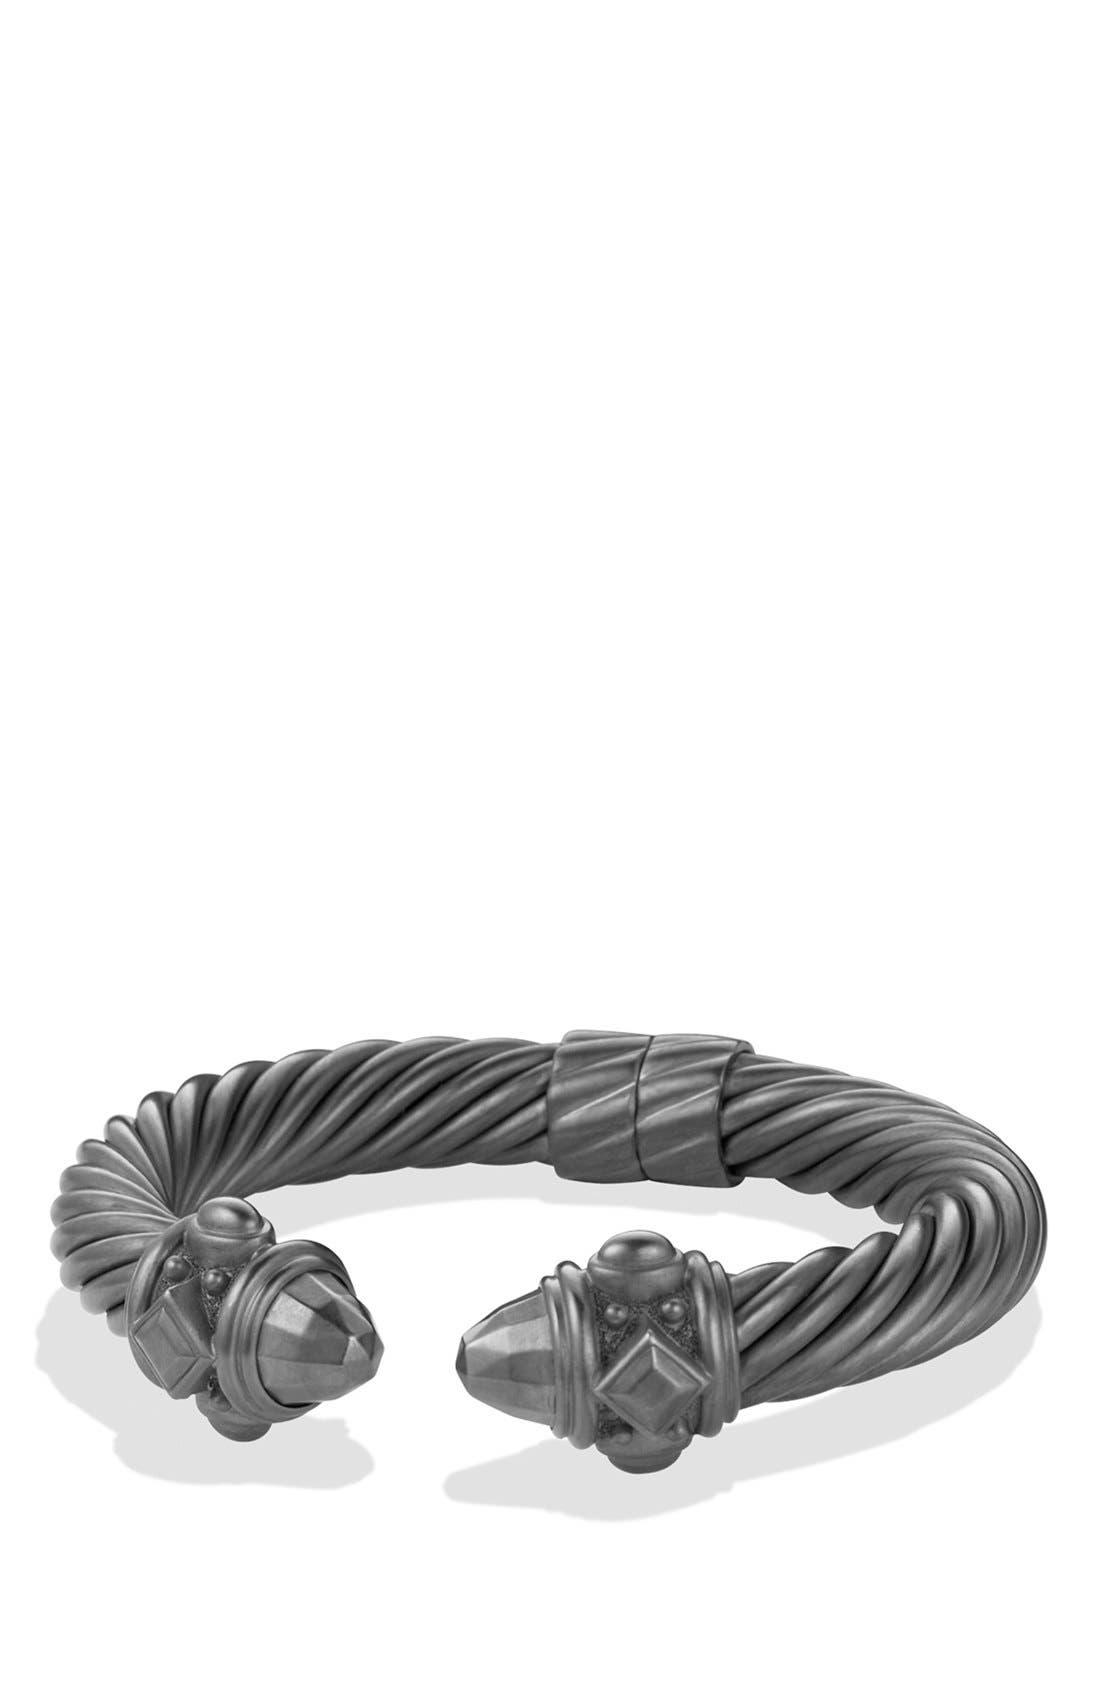 Renaissance Bracelet, 0mm,                             Main thumbnail 1, color,                             BLACKENED SILVER